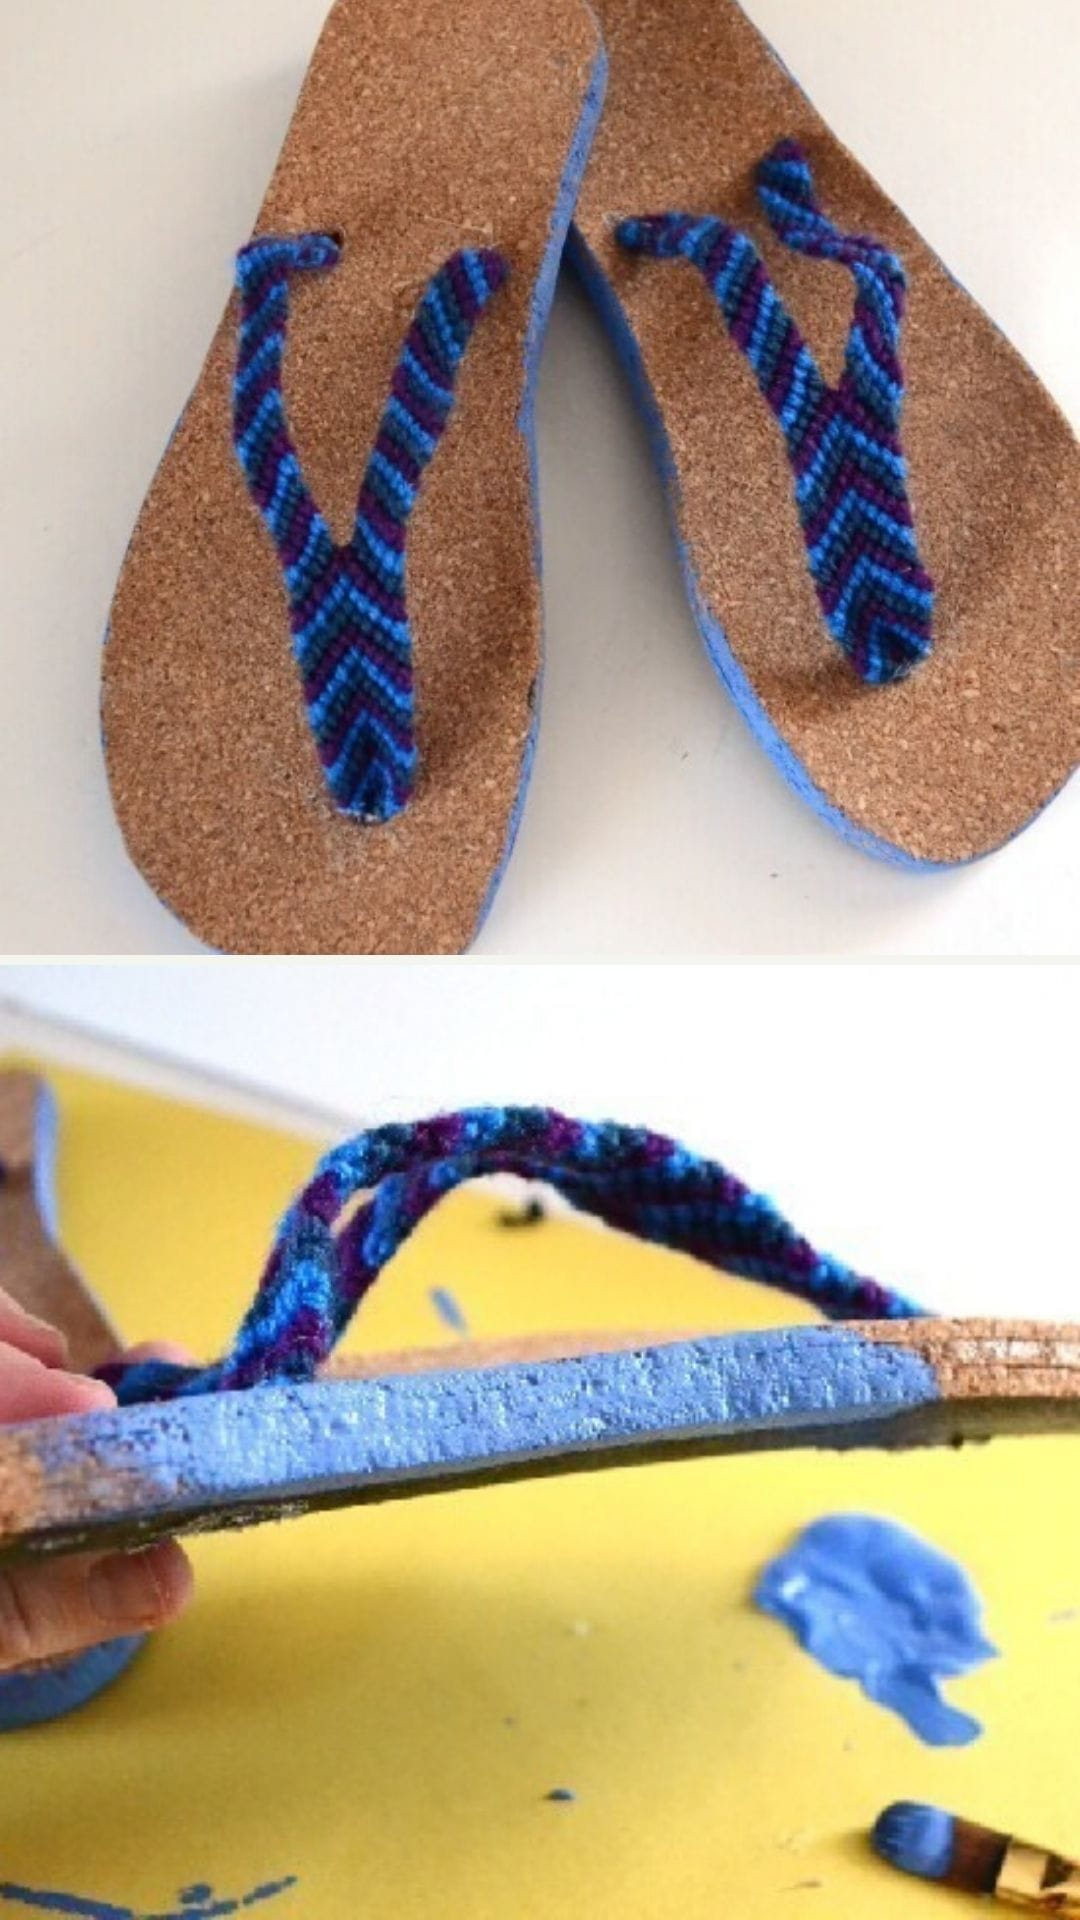 DIY Flip Flops with Friendship Bracelet Straps